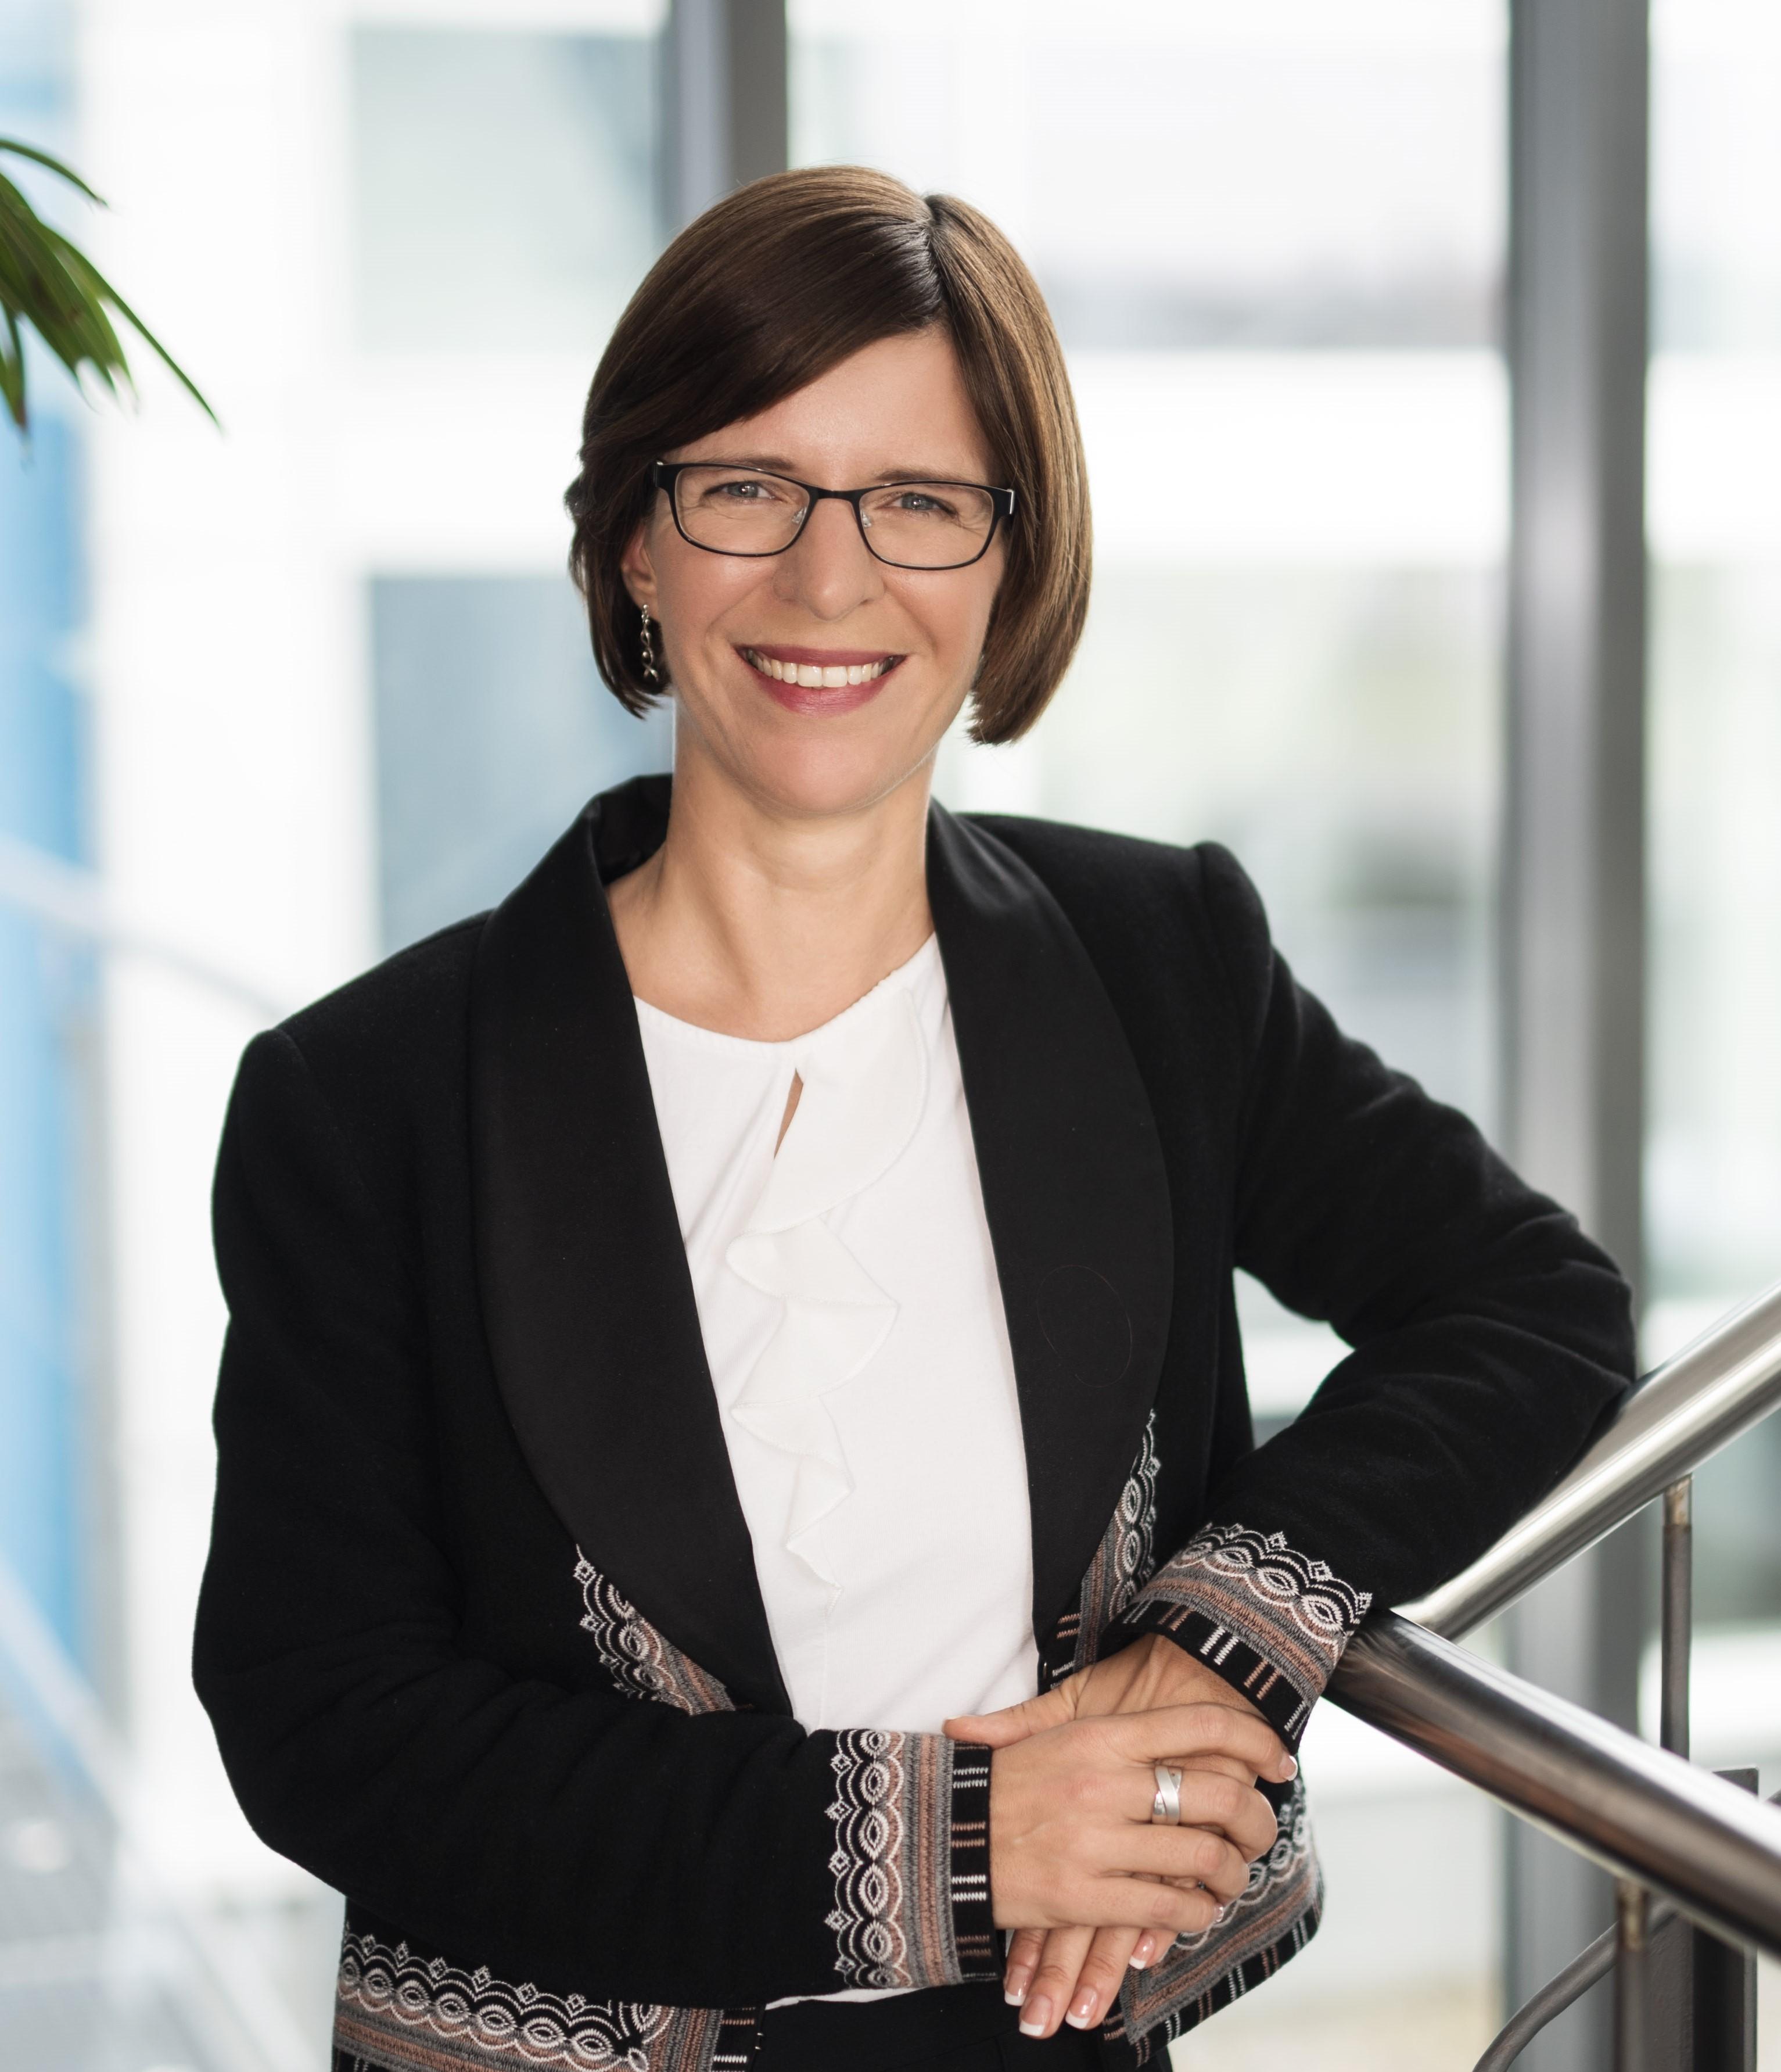 Katrin Taepke Traumbeere Fasching Expertin